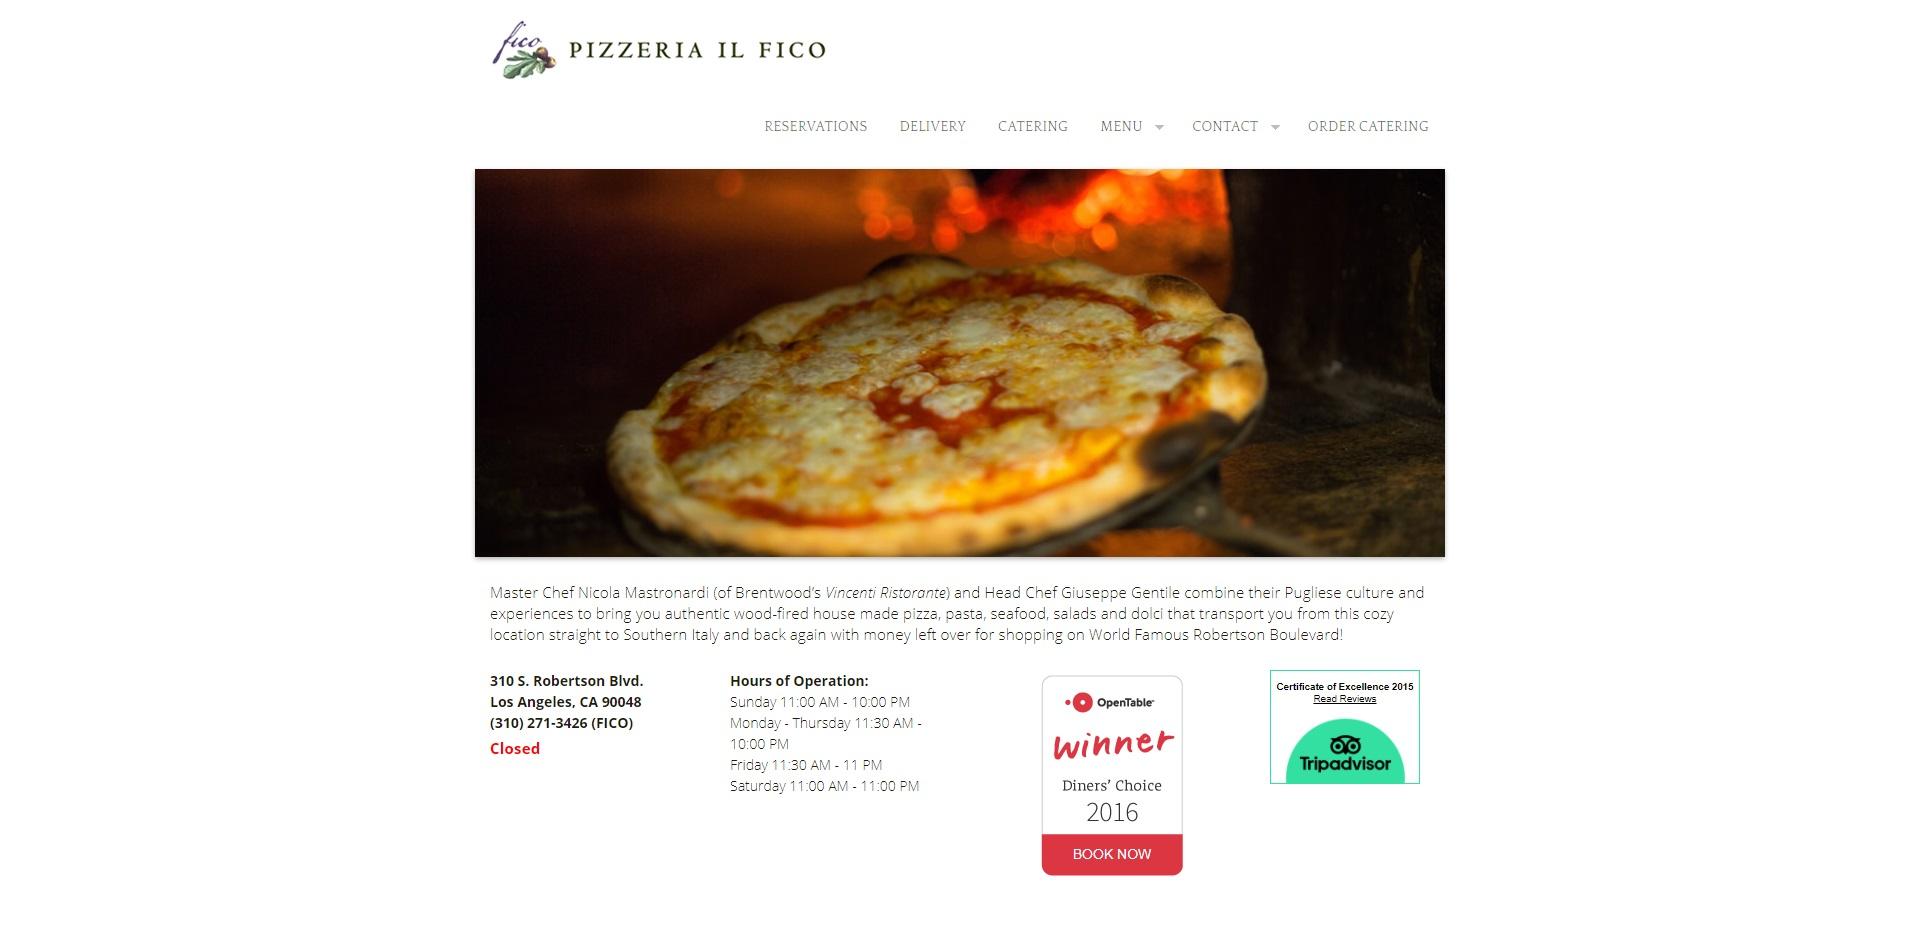 Best Pizzeria in Los Angeles